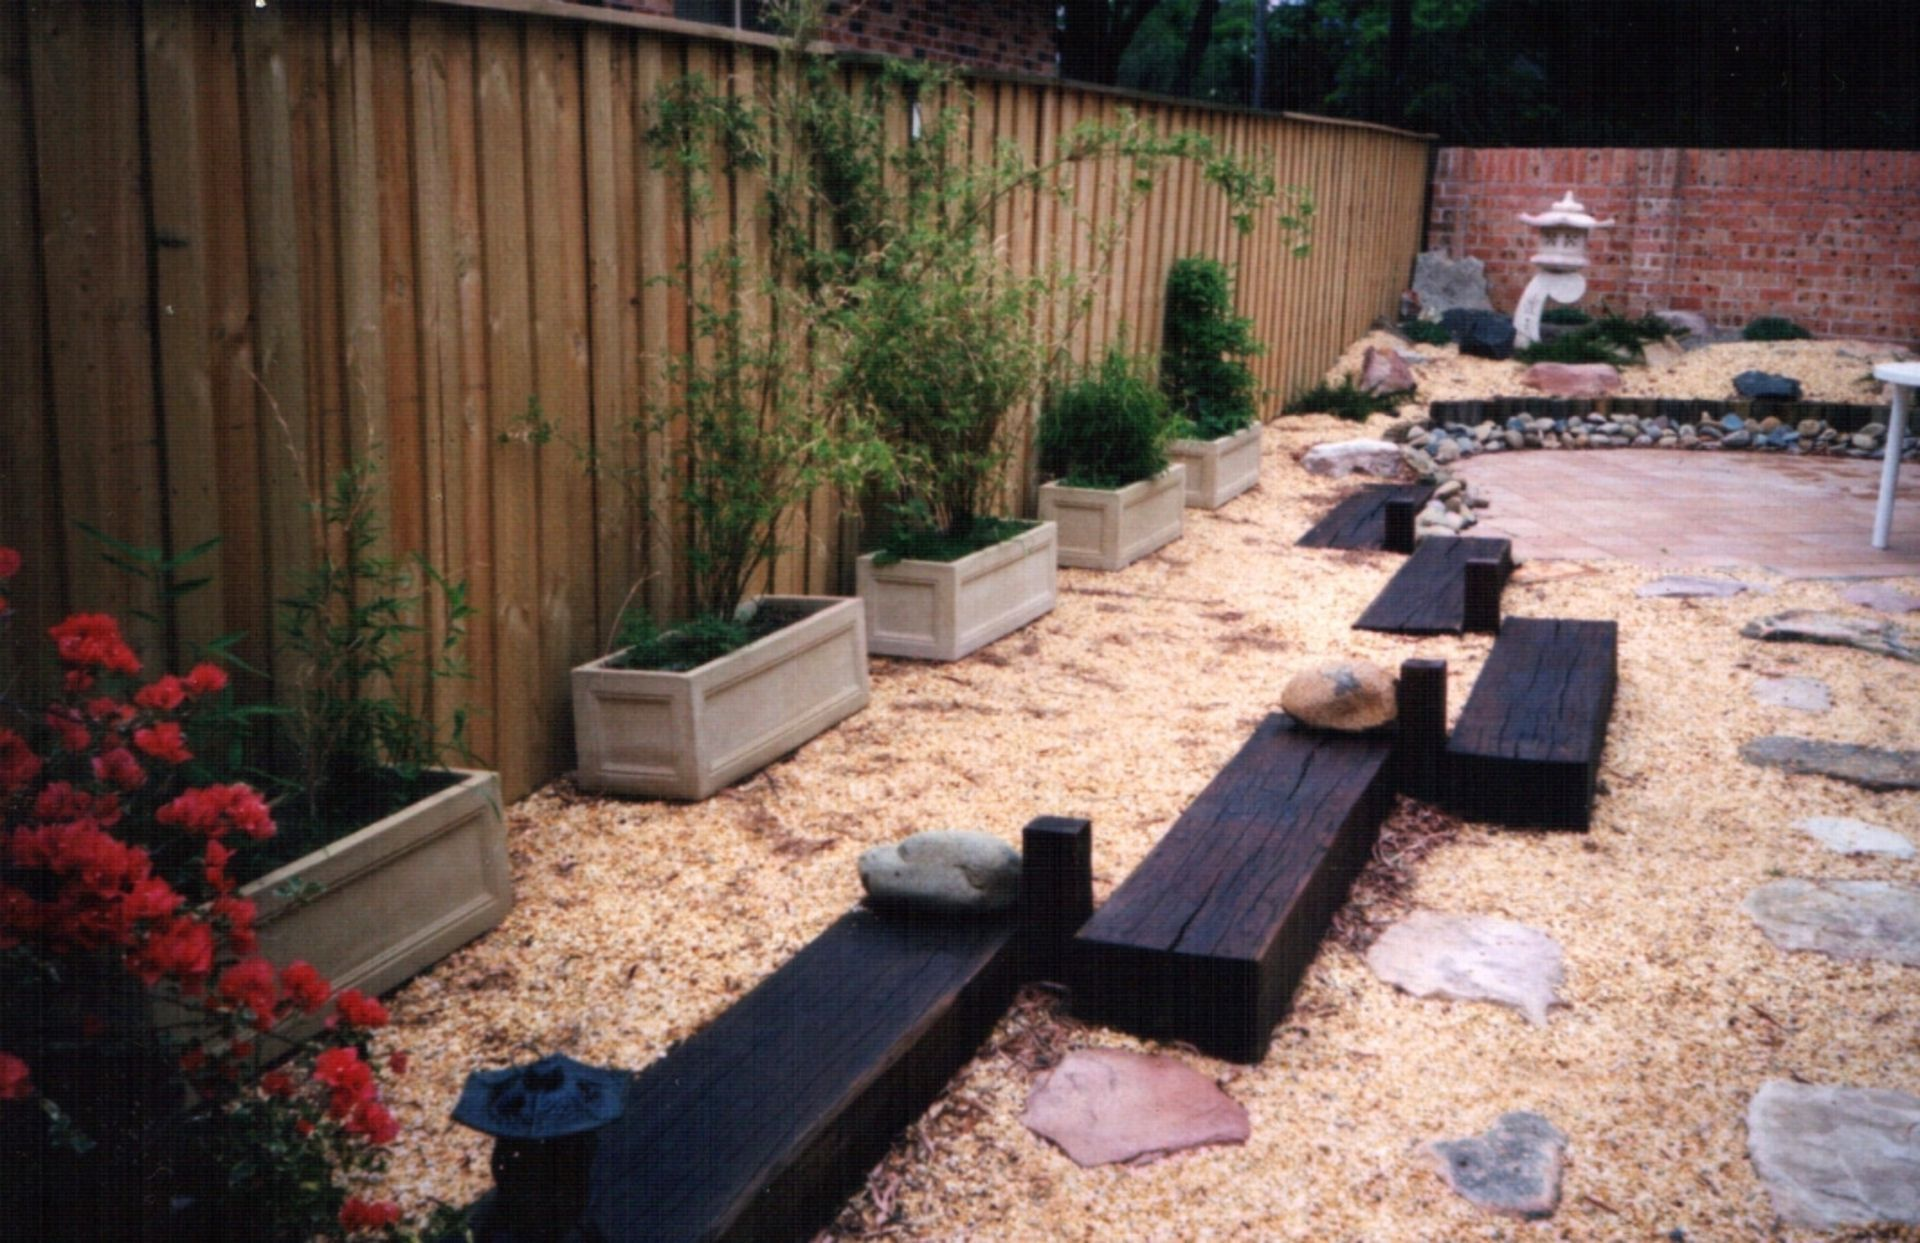 cheap backyard ideas no grass | Small front yard ... on Cheap No Grass Backyard Ideas  id=12666